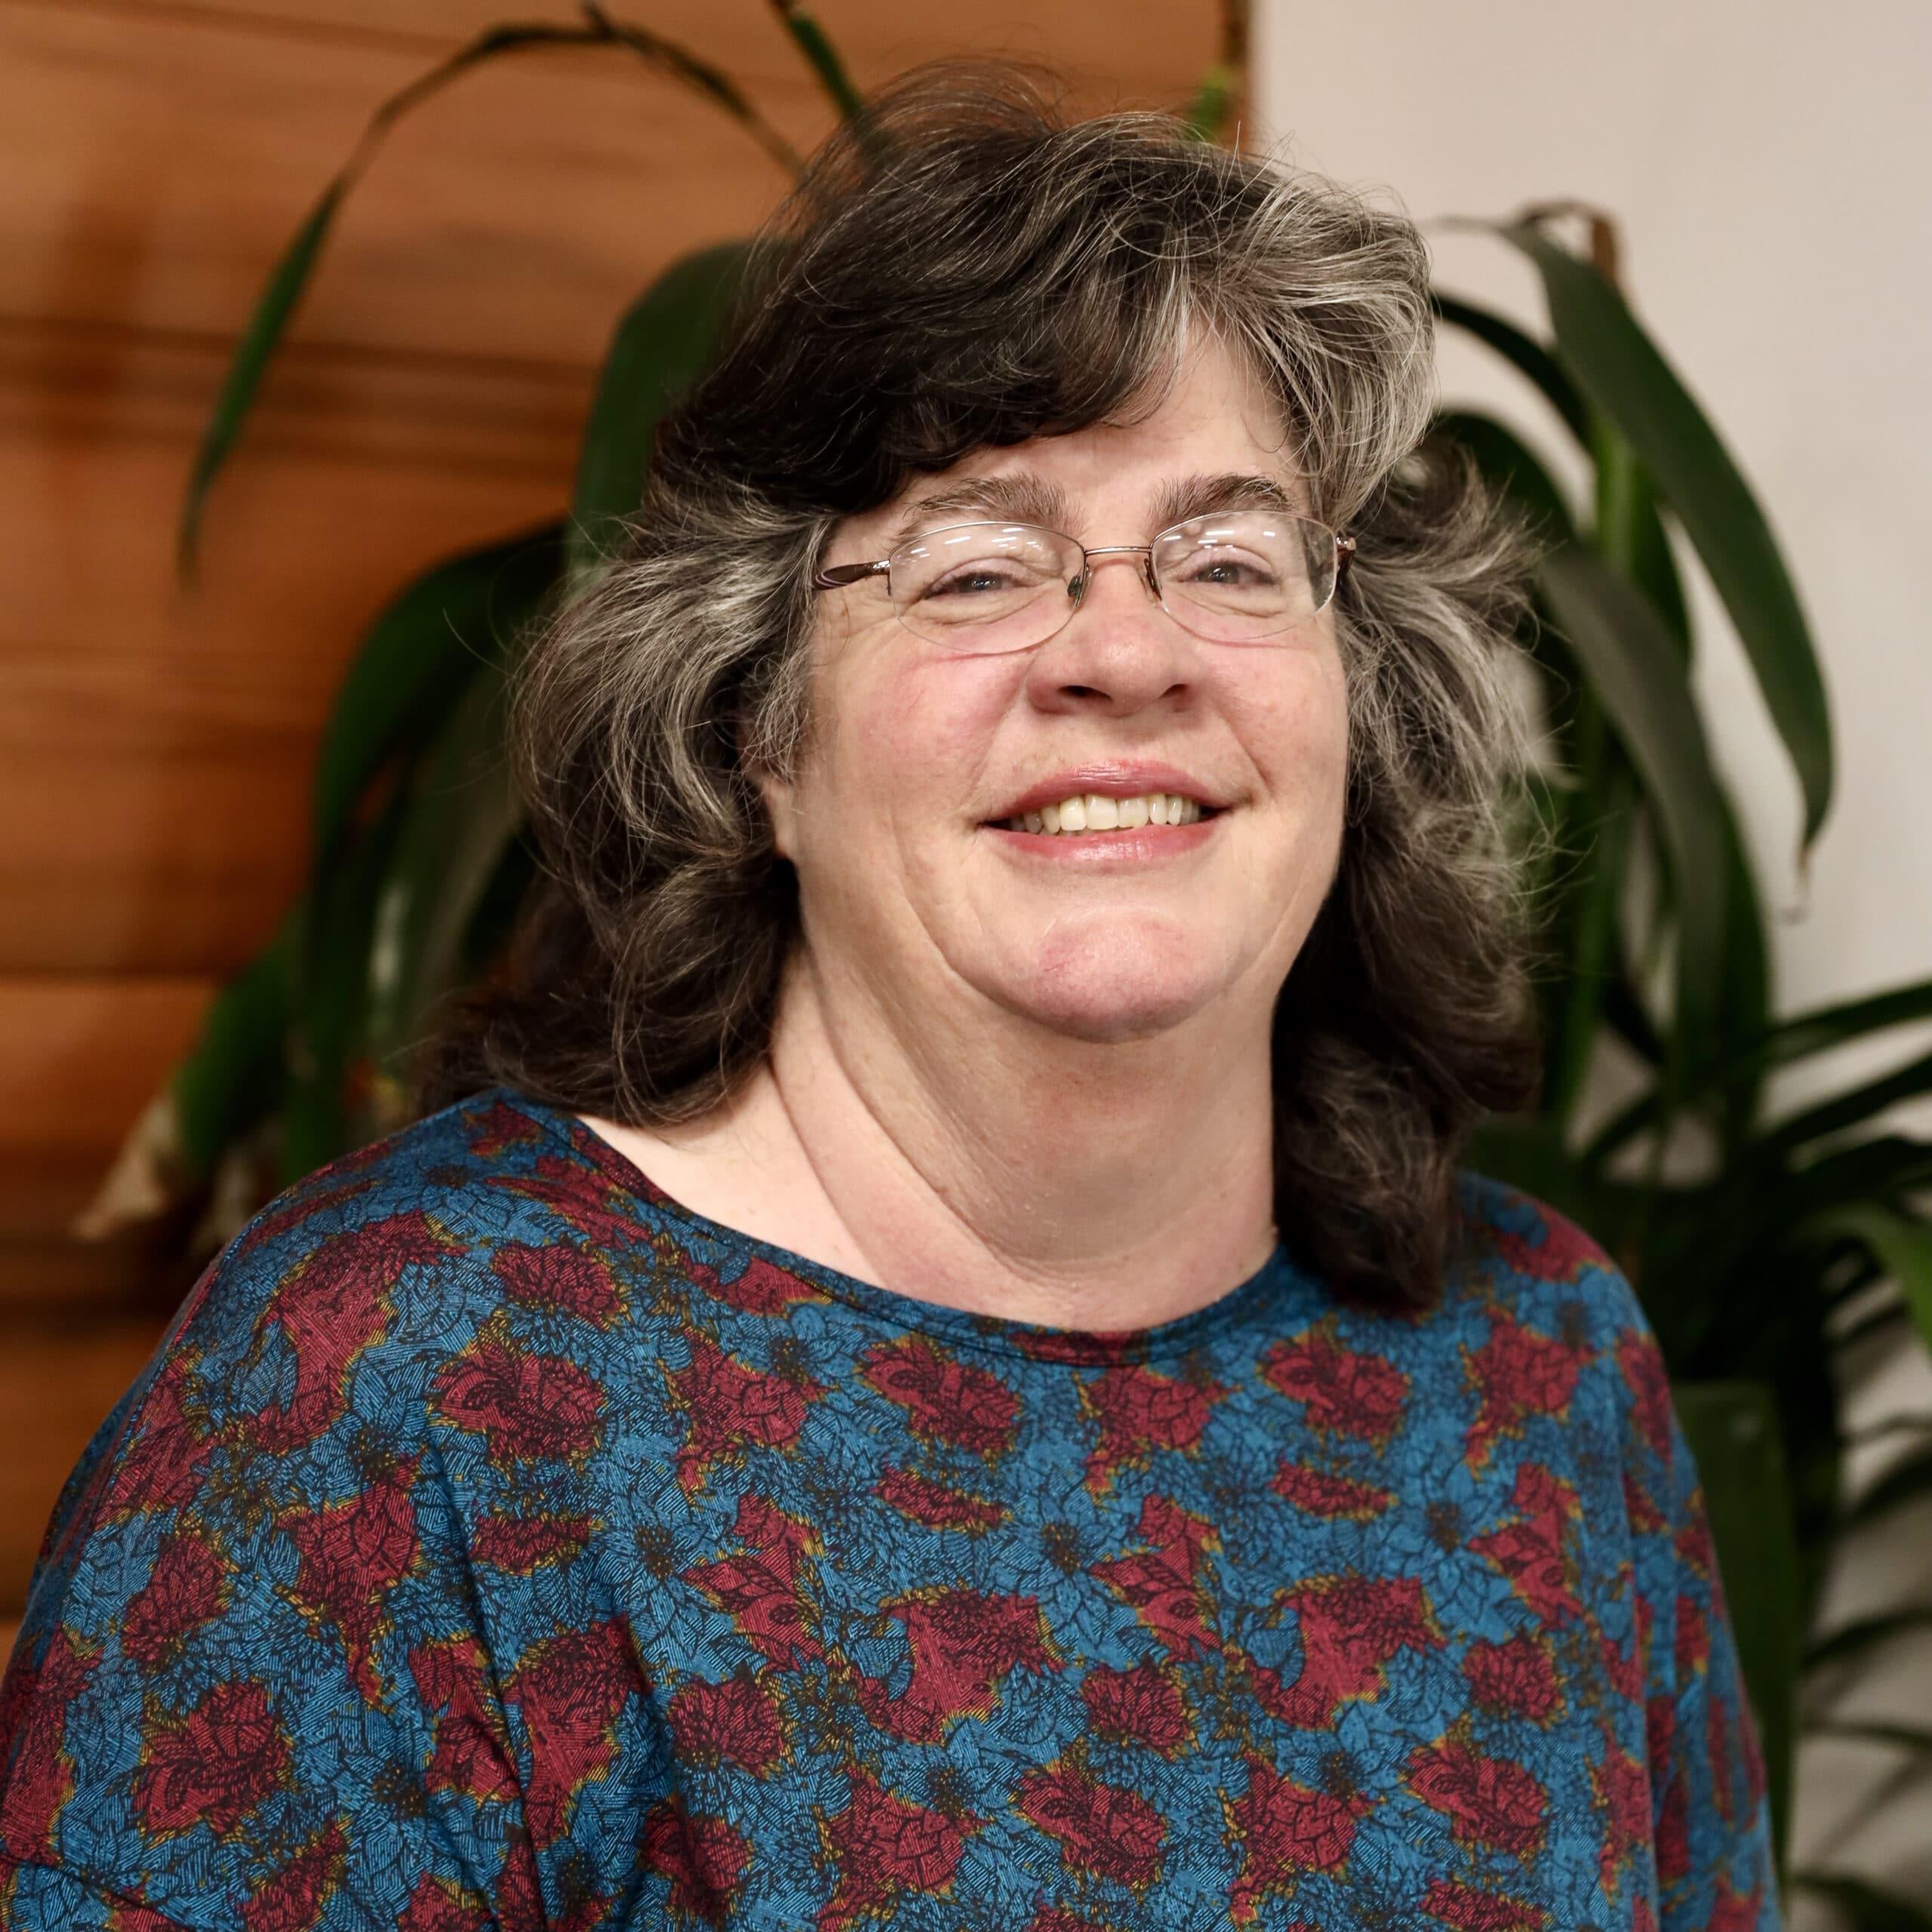 Lynette Kuchta